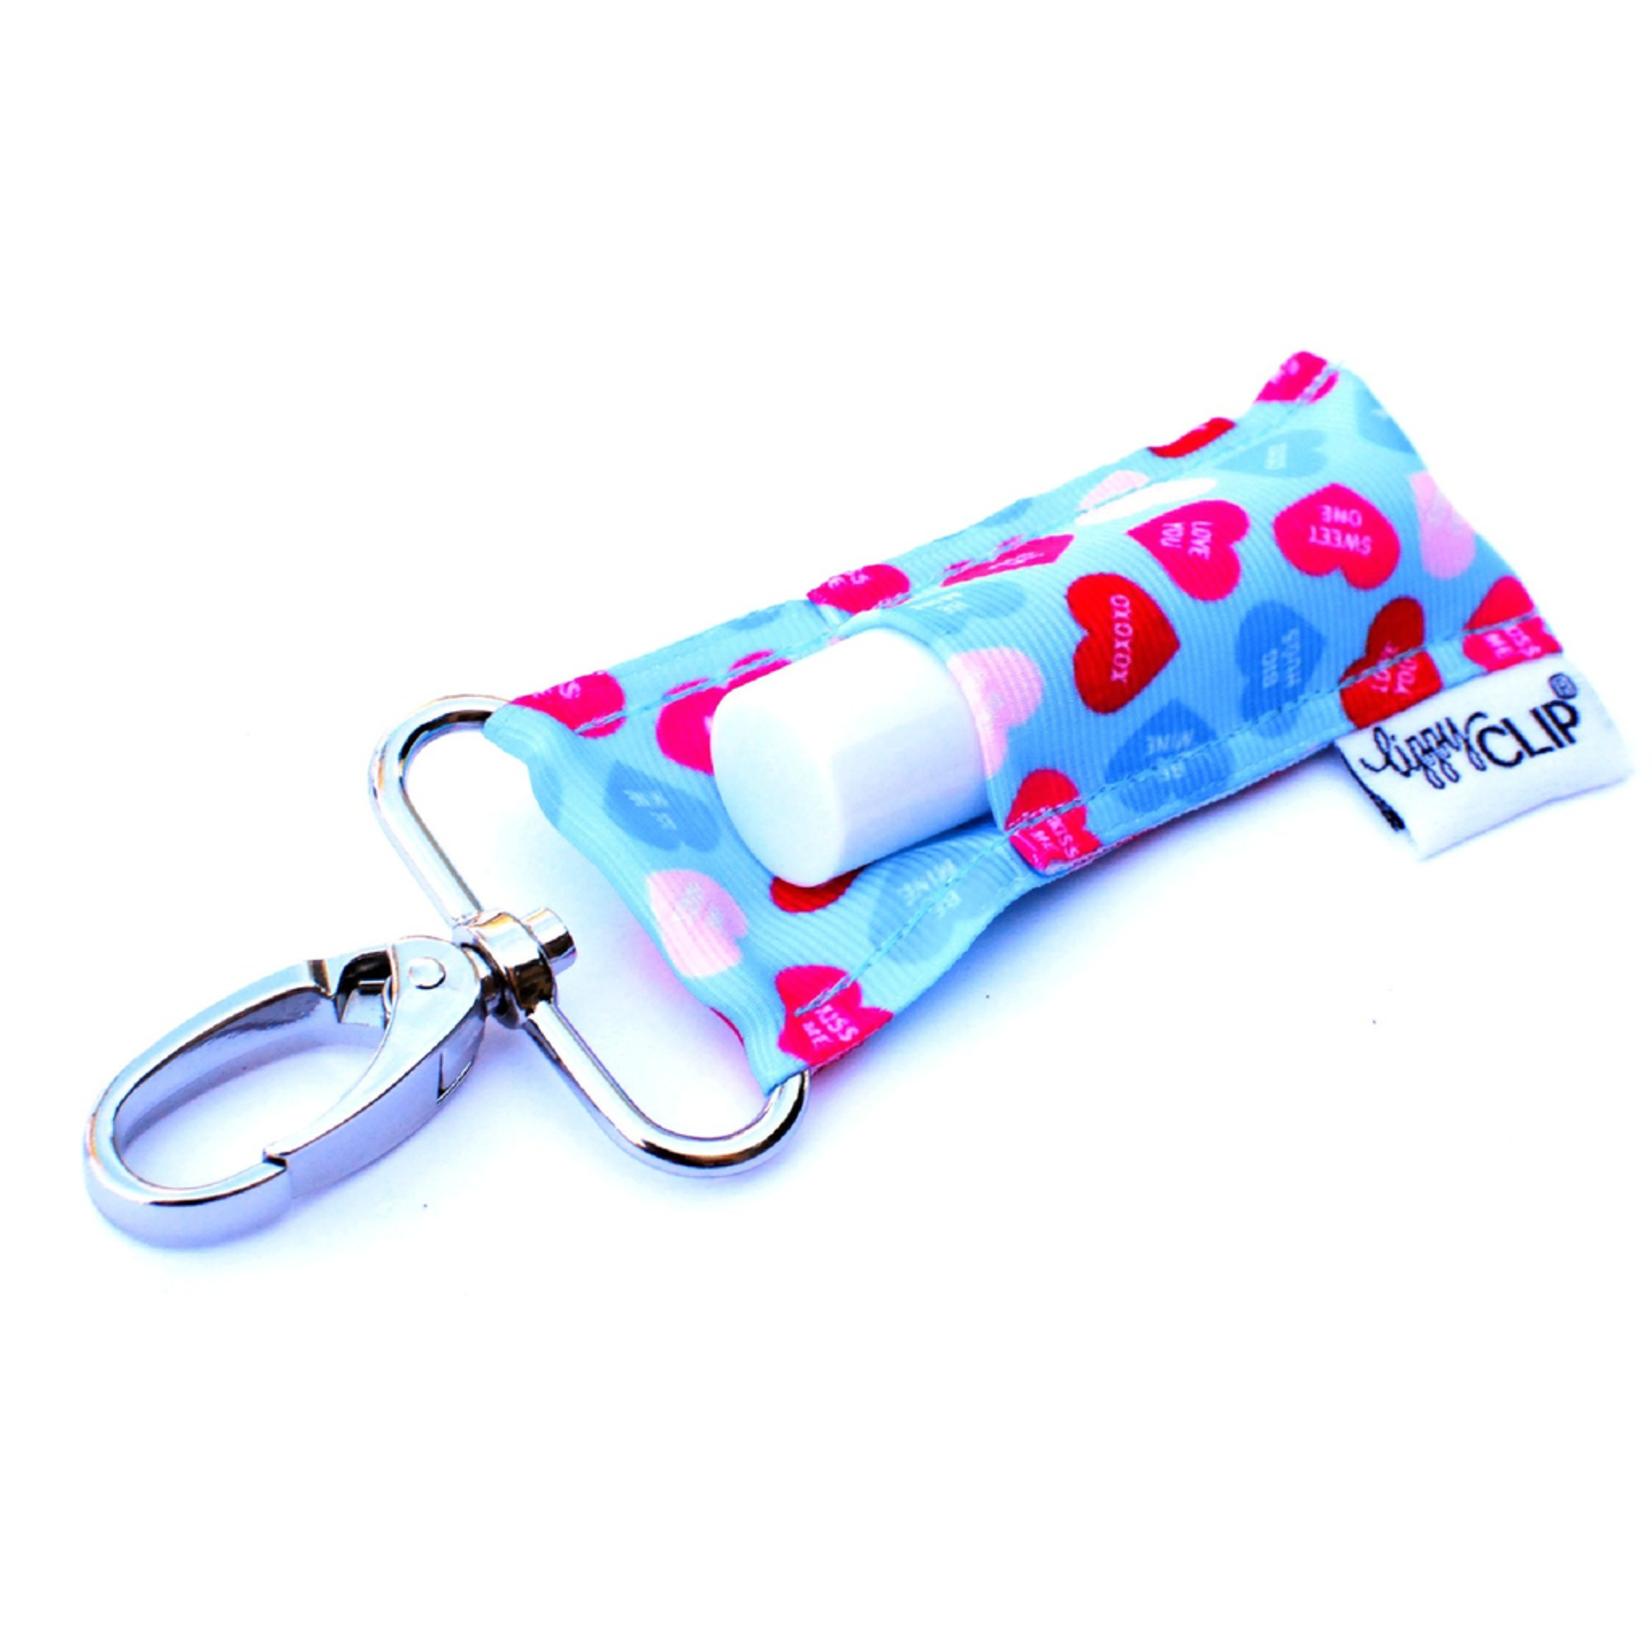 LippyClip Aqua hearts lip balm holder